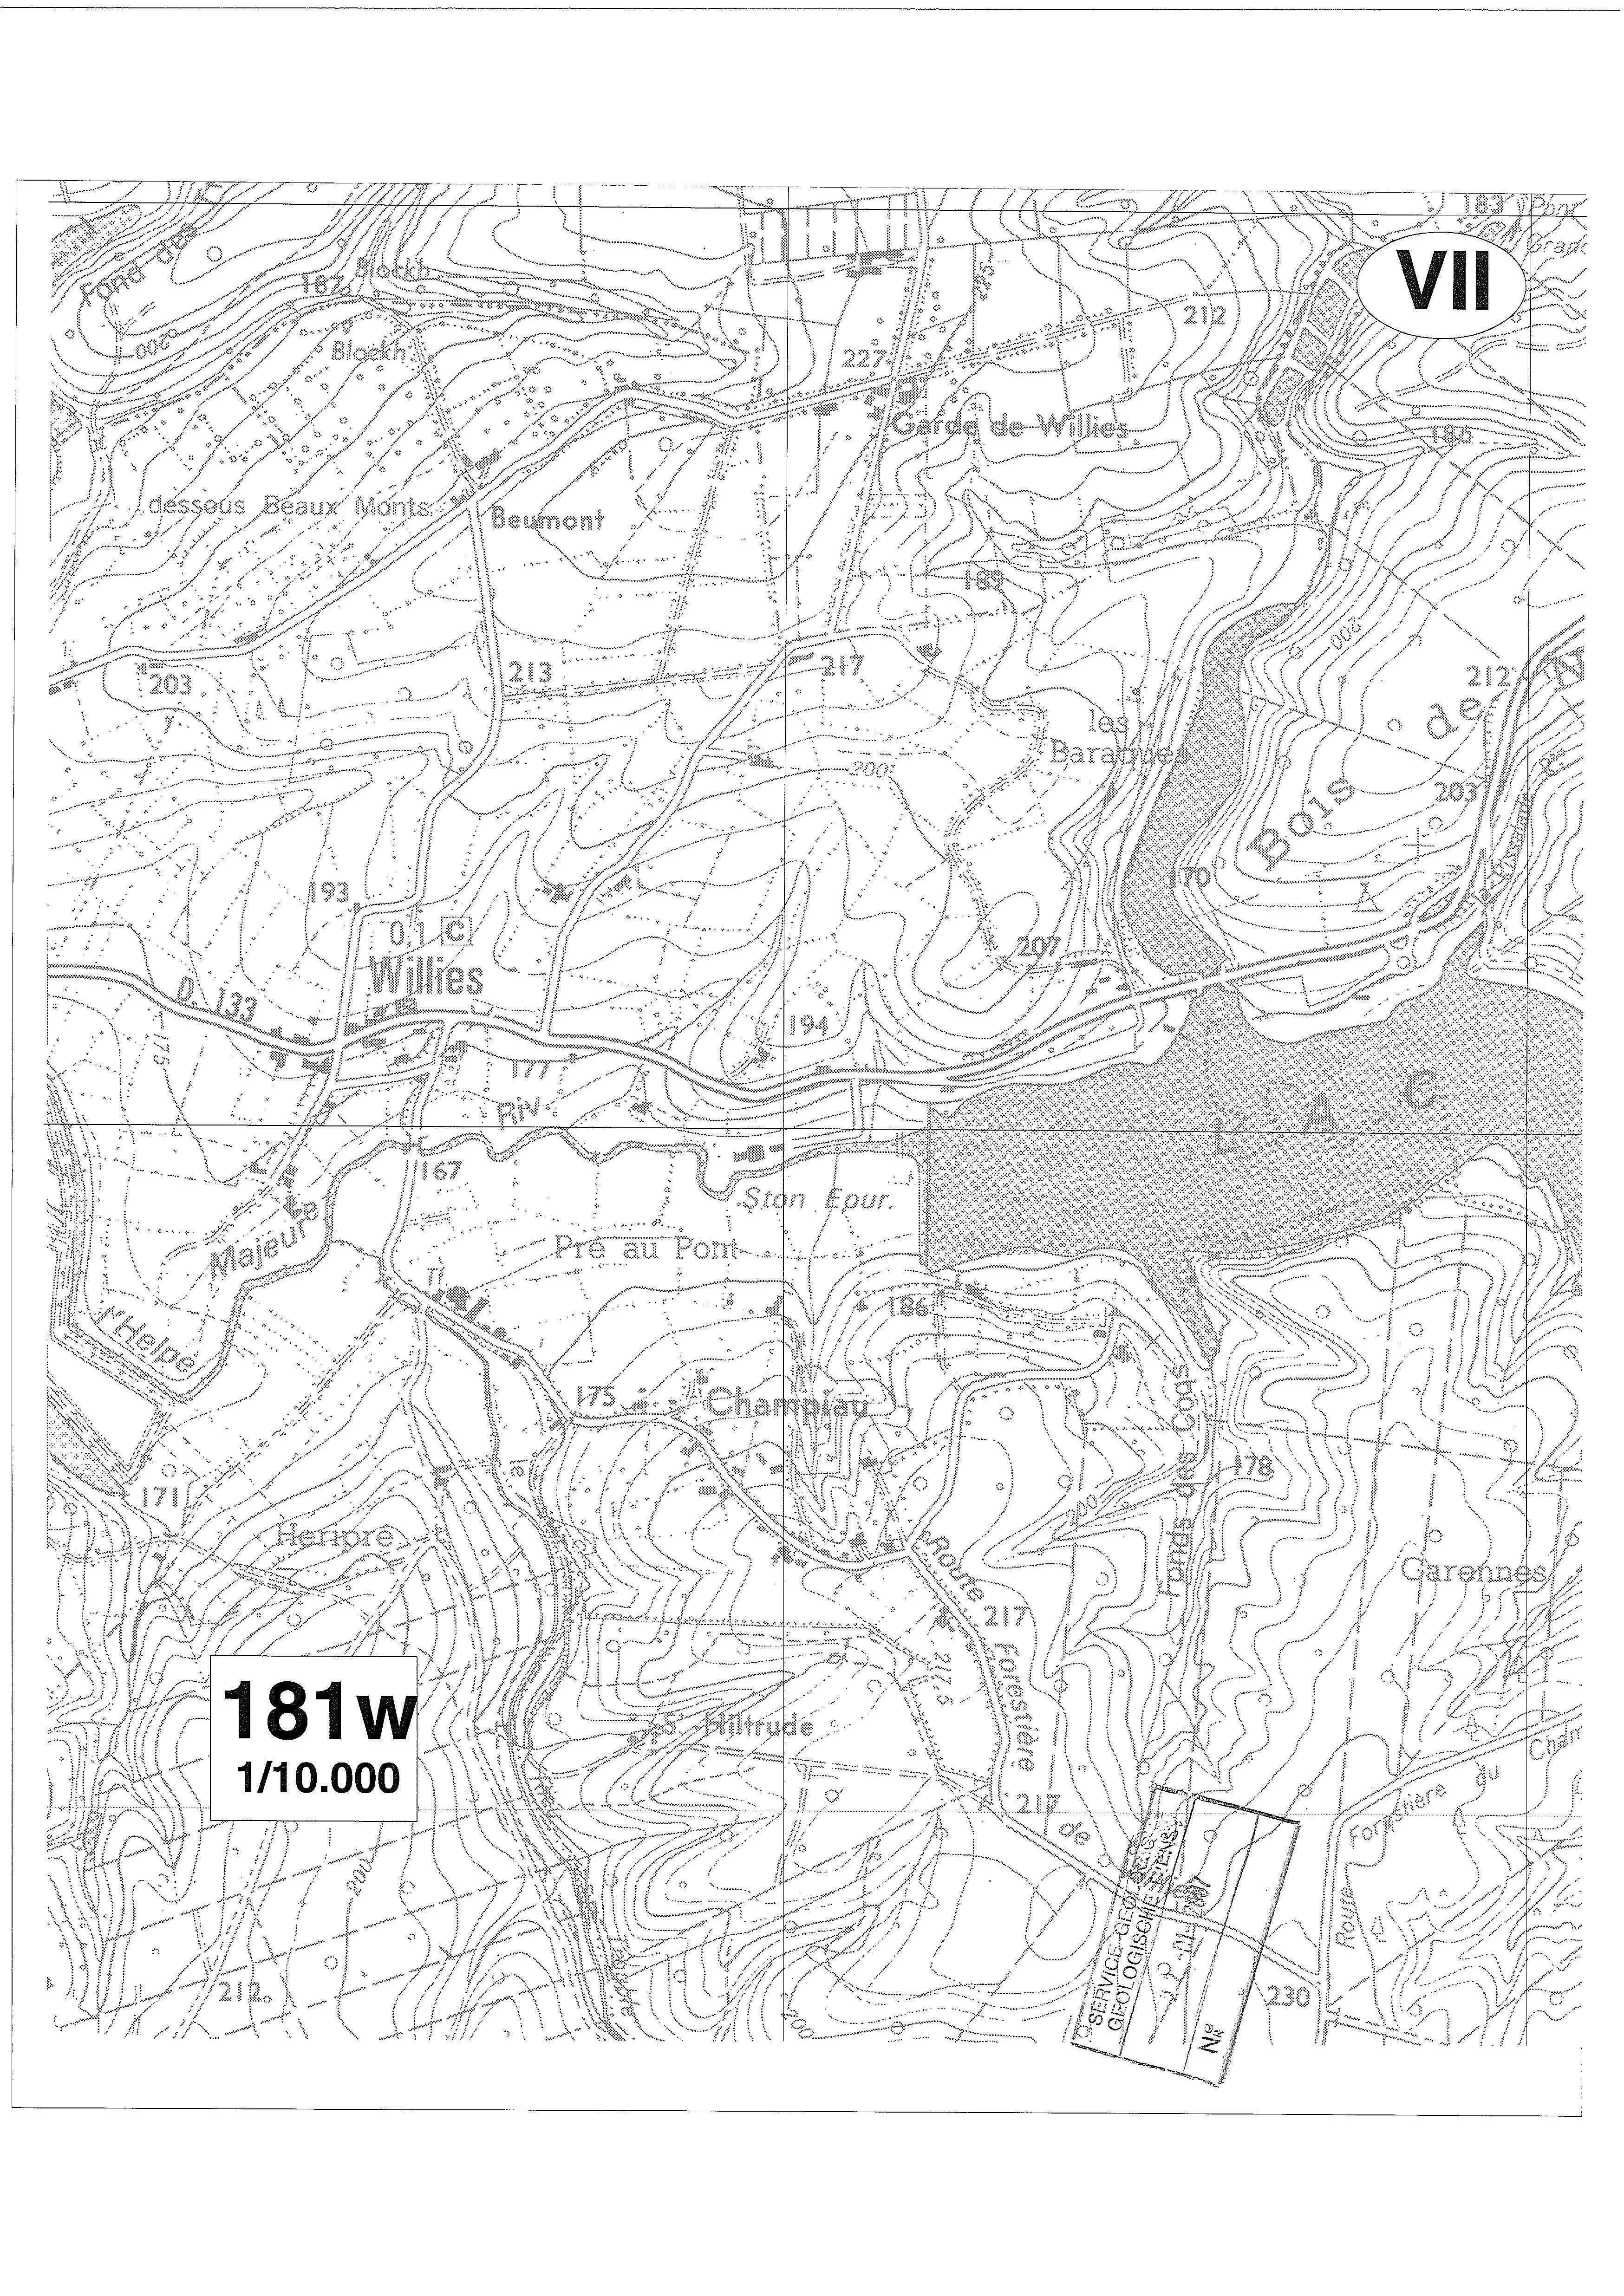 181W_Sivry_Page_7_Image_0001.jpg